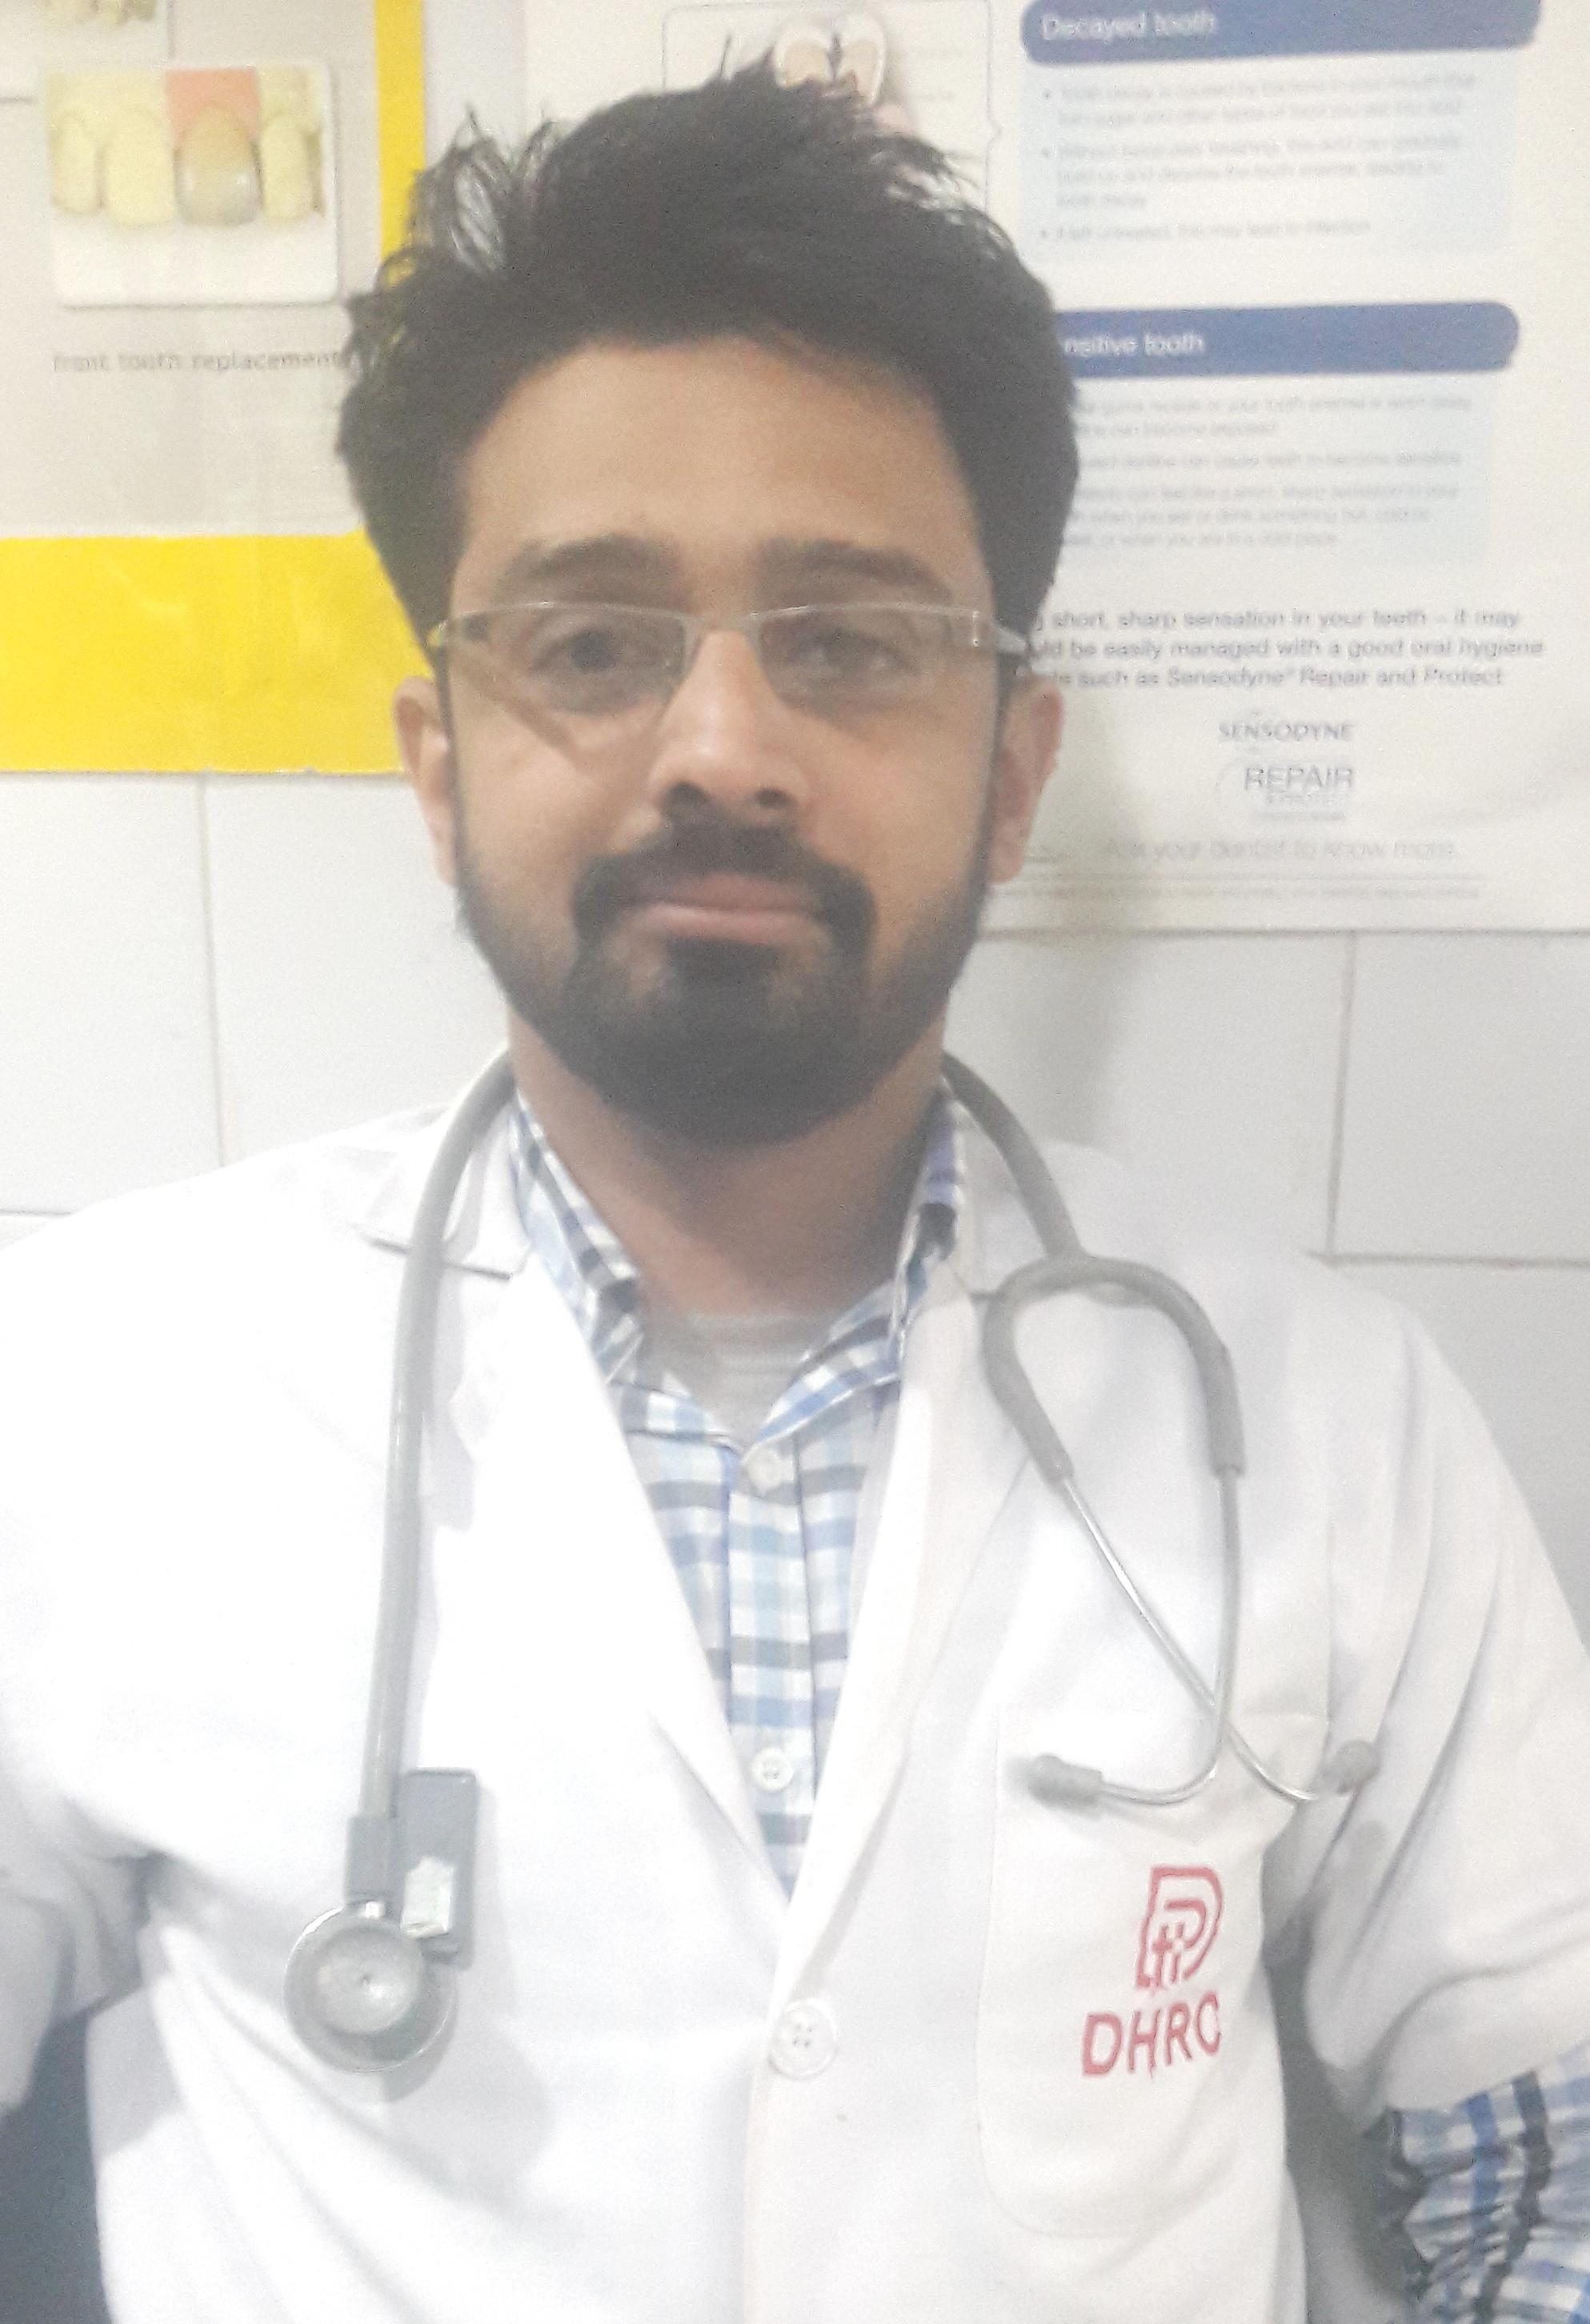 Dr. Tarpit Bhargava